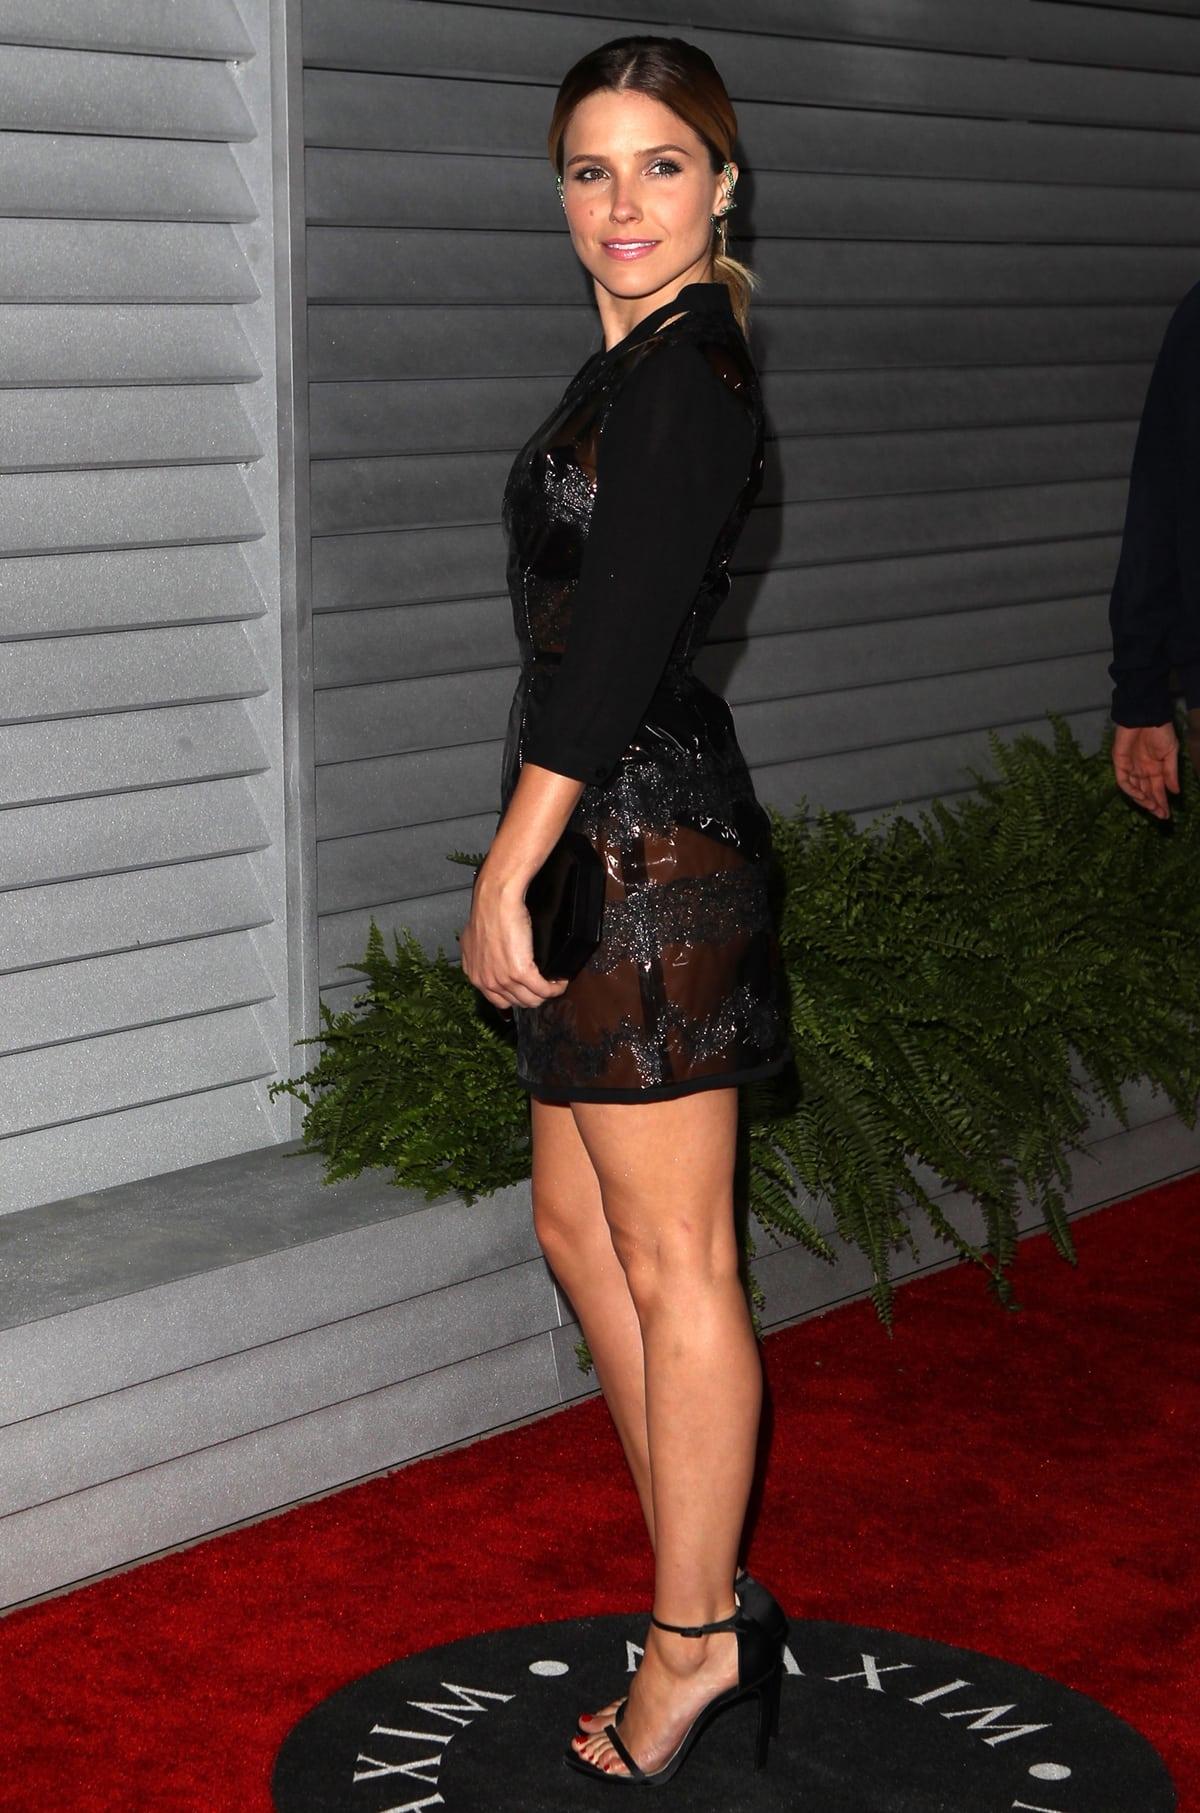 Sophia Bush displays her hot legs in a sexy Fleur du Mal dress